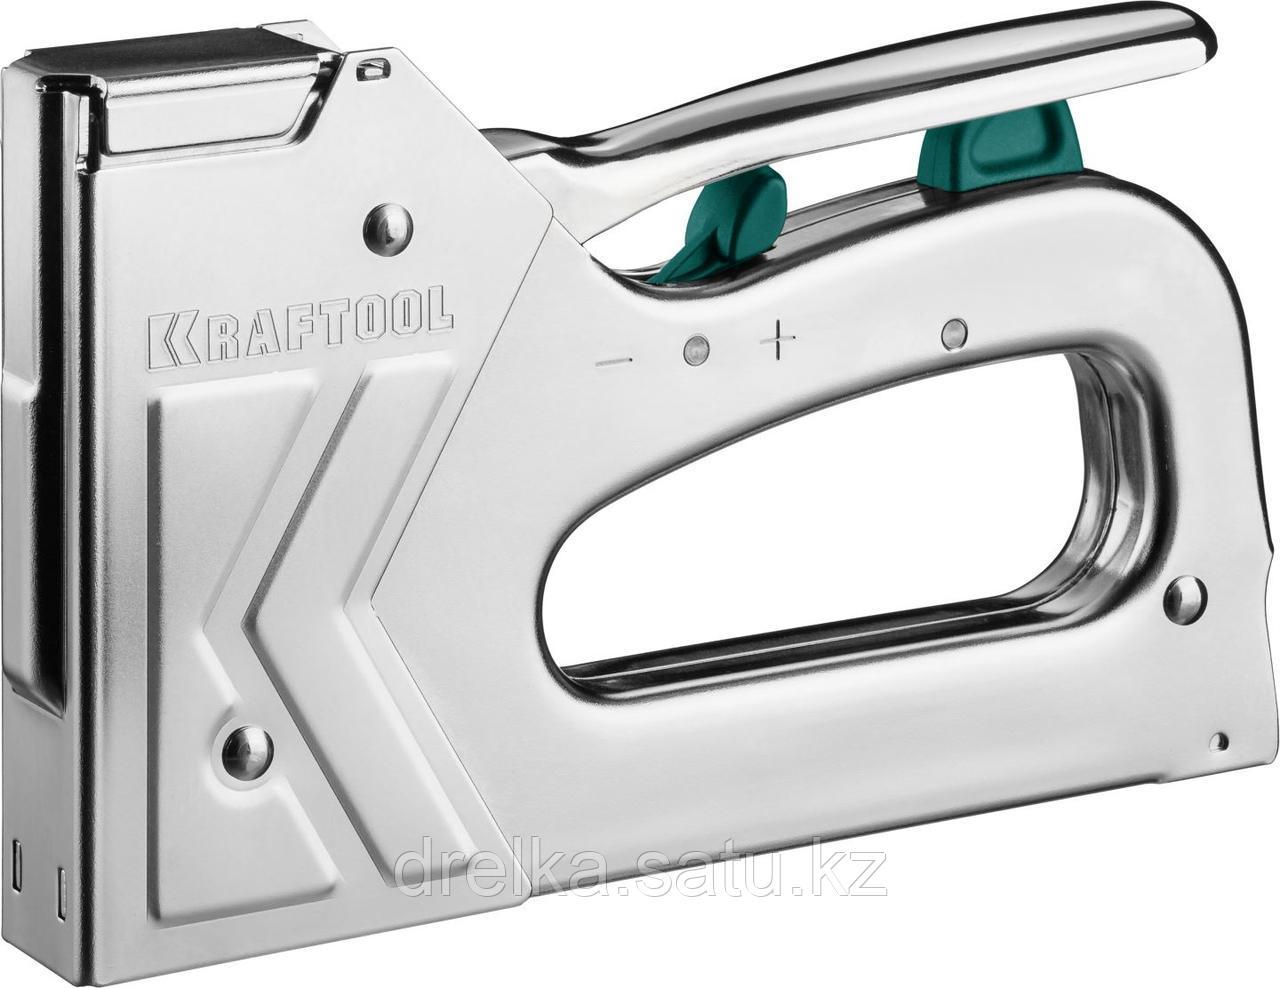 "Степлер для скоб ""GRAND 140"" 3-в-1: тип 140 (6-16 мм) / 300 (16 мм) / 500 (16 мм), KRAFTOOL"